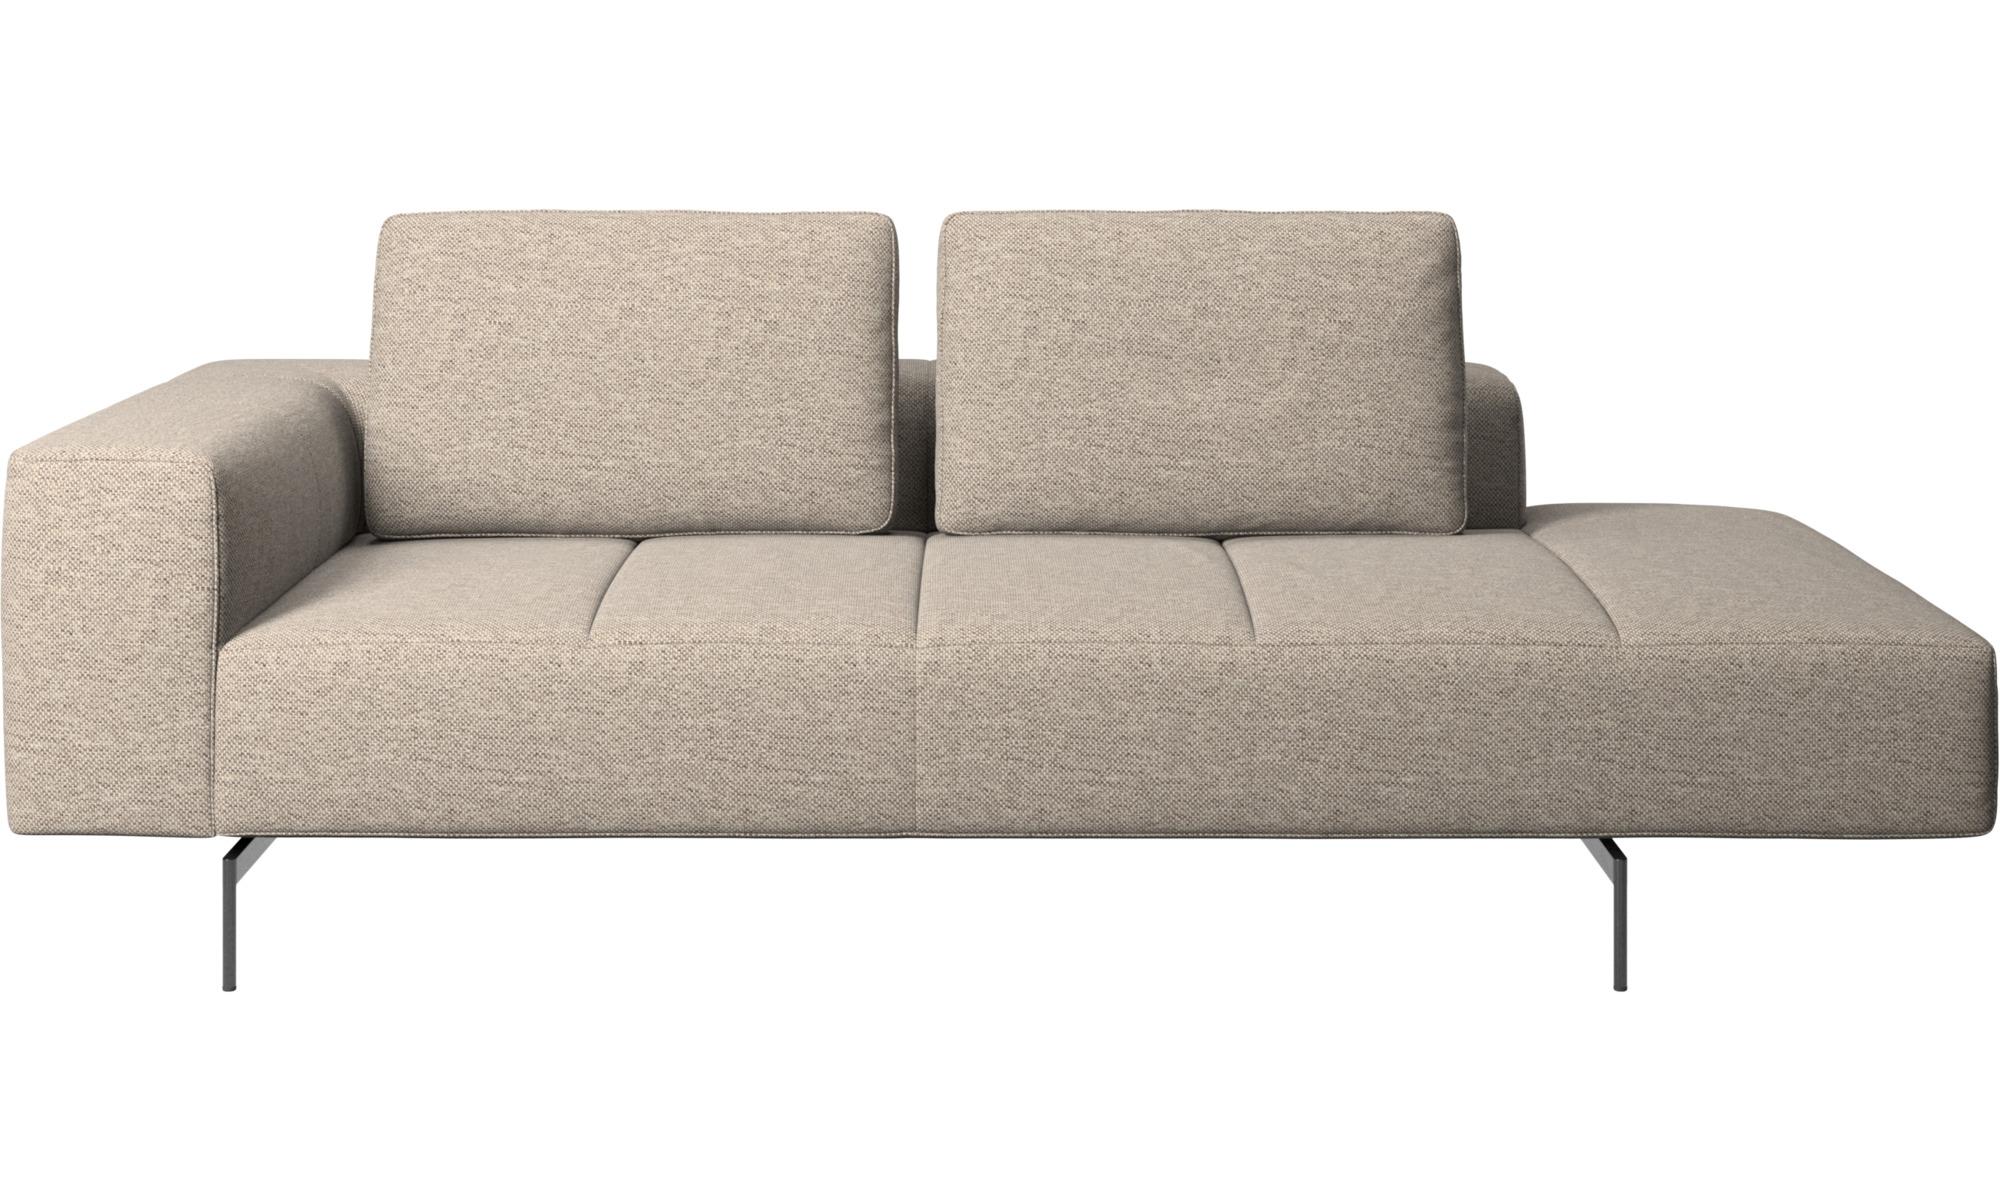 Modulare Sofas - Amsterdam Sofa-Ruhemodul, Armlehne links, offenes Ende rechts - Beige - Stoff